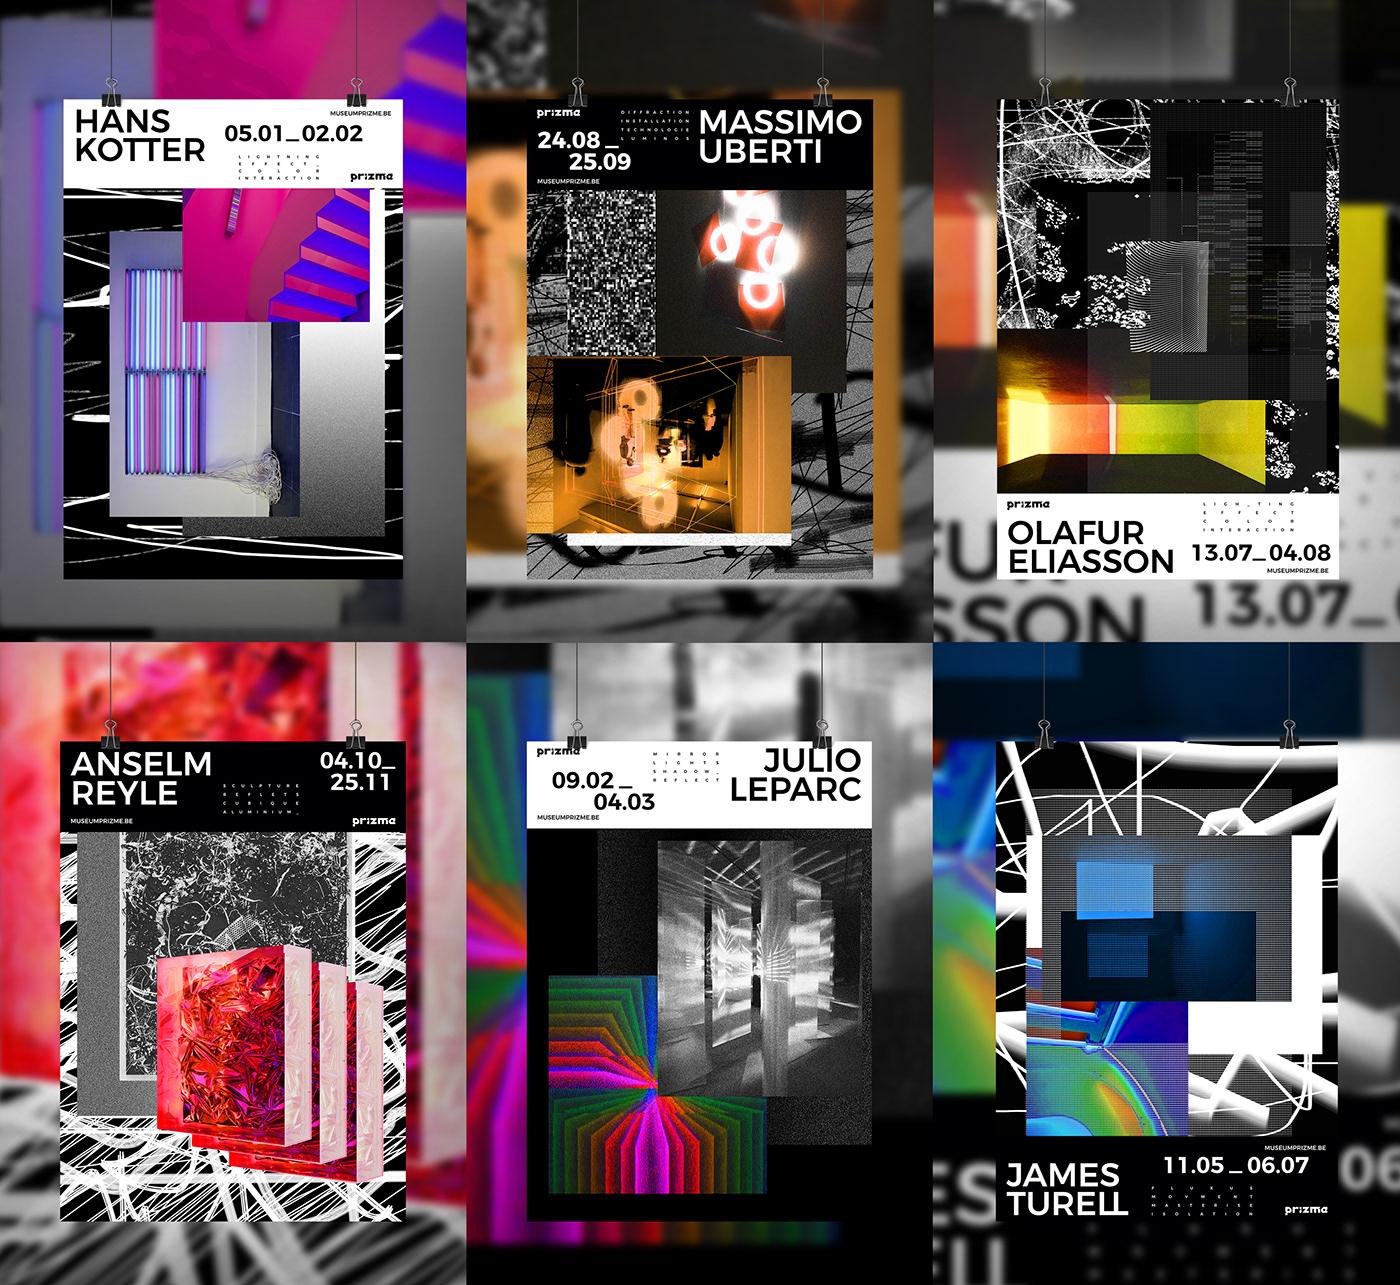 poster prisme museum edition light typography   calendar Objet dérivé flipbook festival